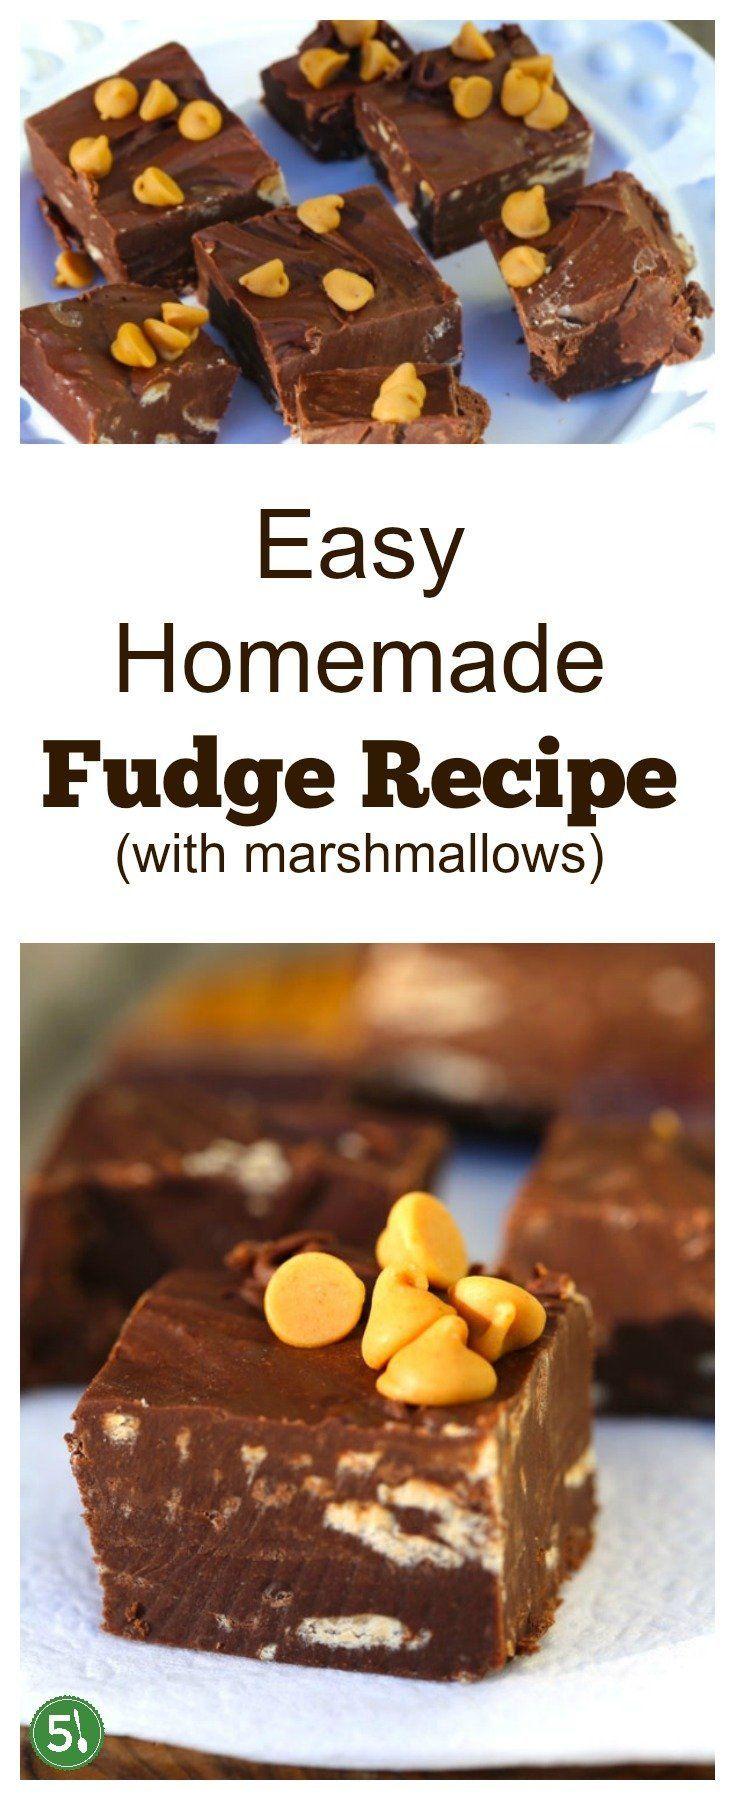 Easy Fudge Recipe With Marshmallows Recipe Chocolate Chips Recipes Recipes With Marshmallows Fudge Recipes Chocolate Recipes